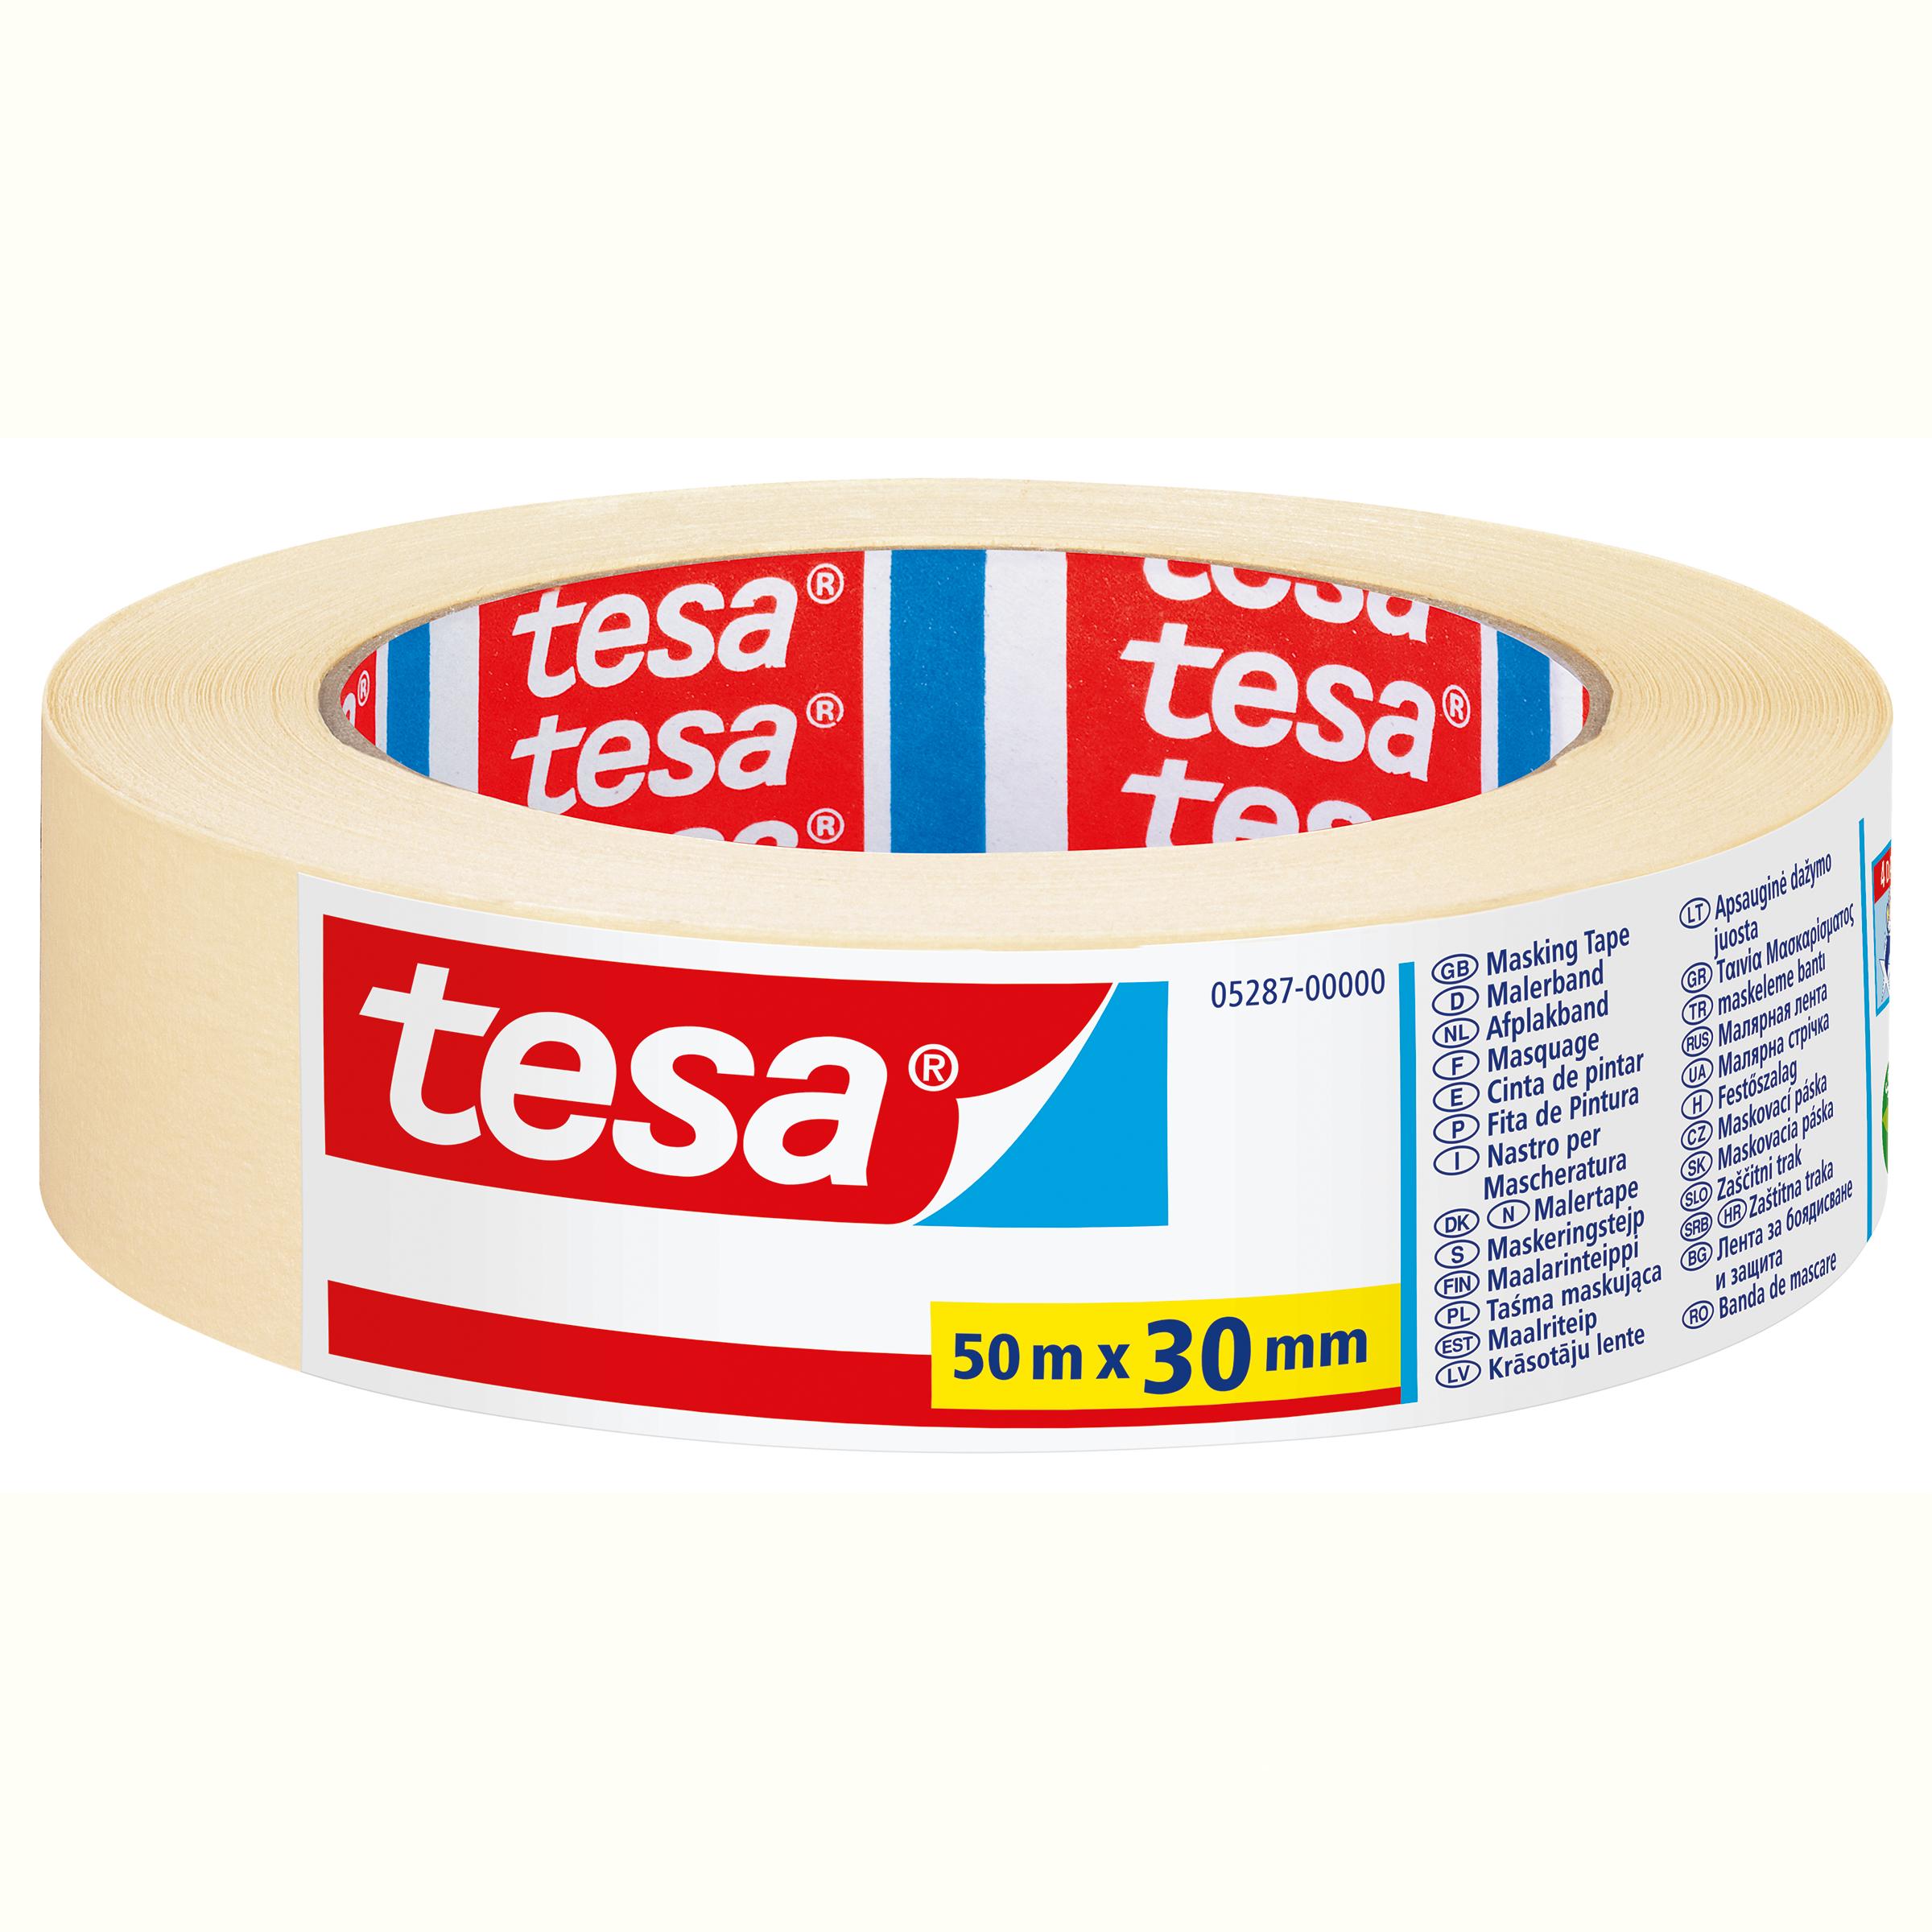 Tesa 05287 - Maler-Abdeckband - Papier - Beige - 4 Tag(e) - 50 m - 30 mm